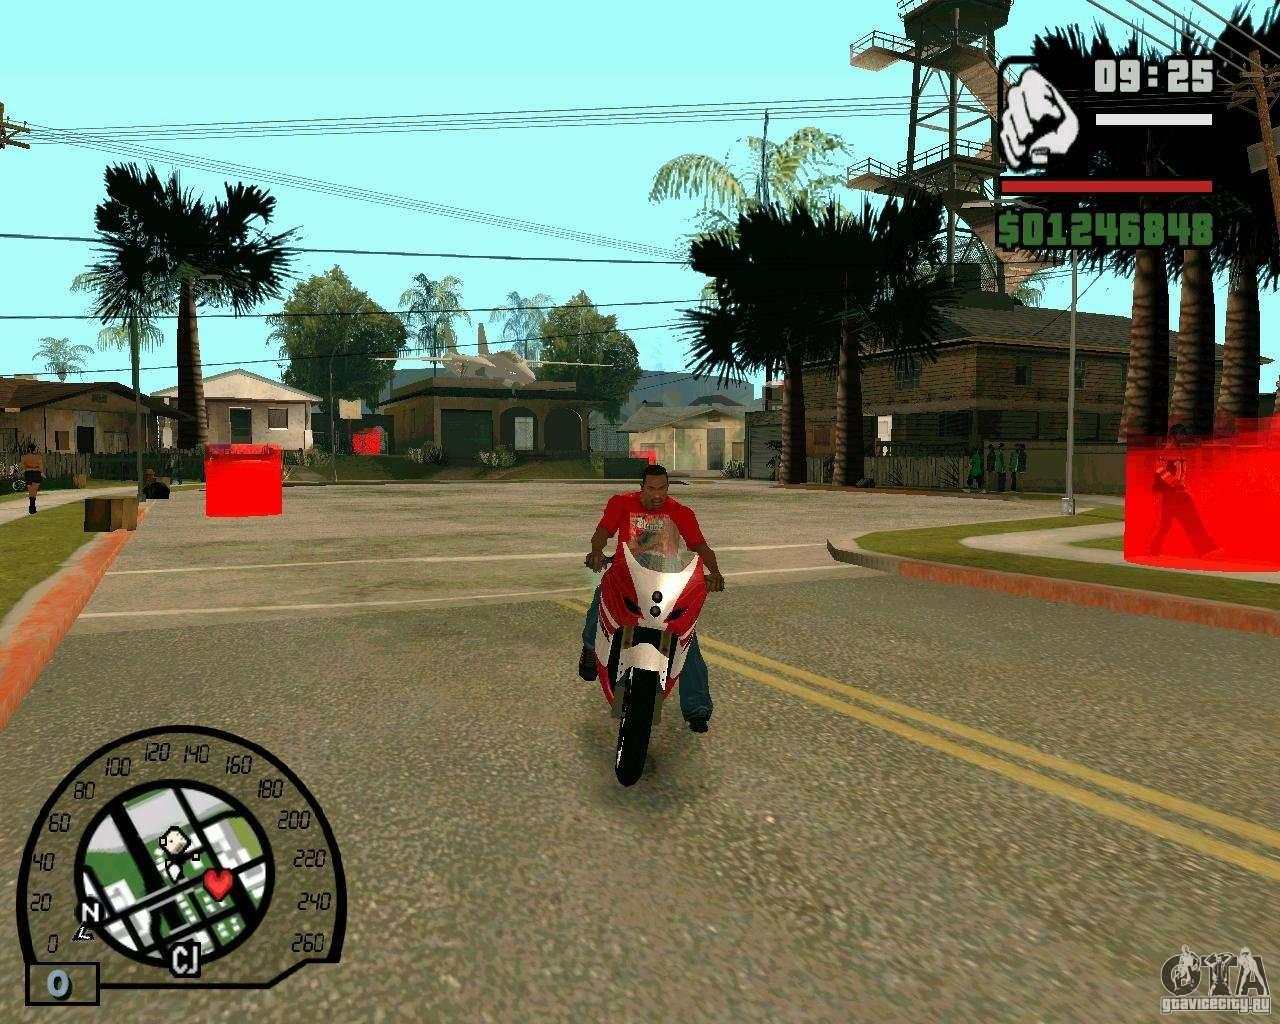 Gtaiv Nrg 900 Rr For Gta San Andreas